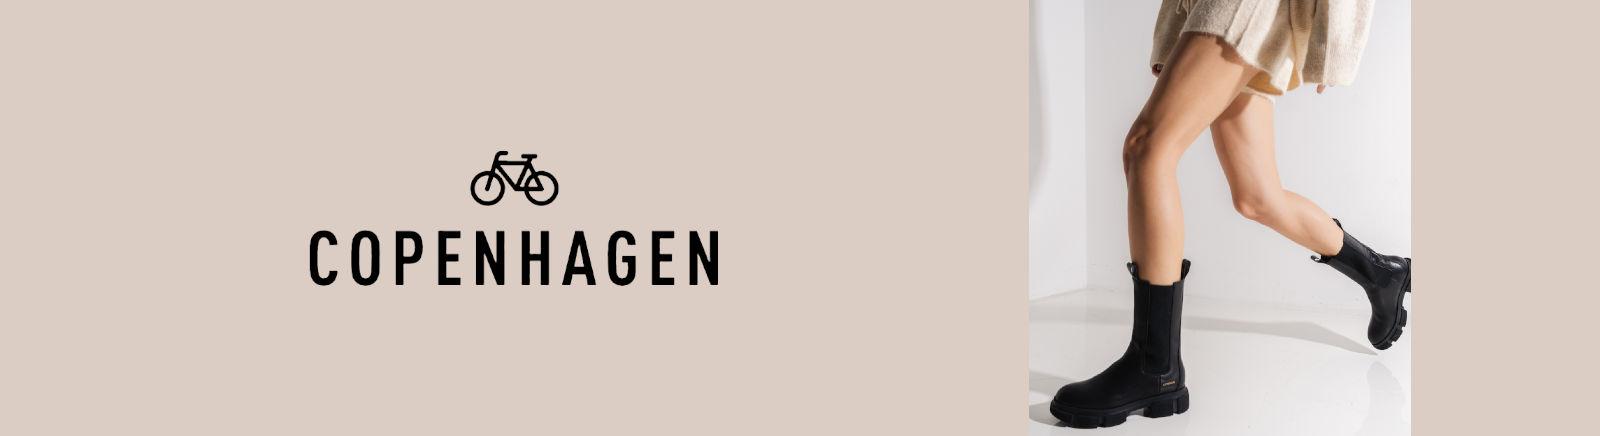 Copenhagen Herrenschuhe online entdecken im Juppen Schuhe Shop